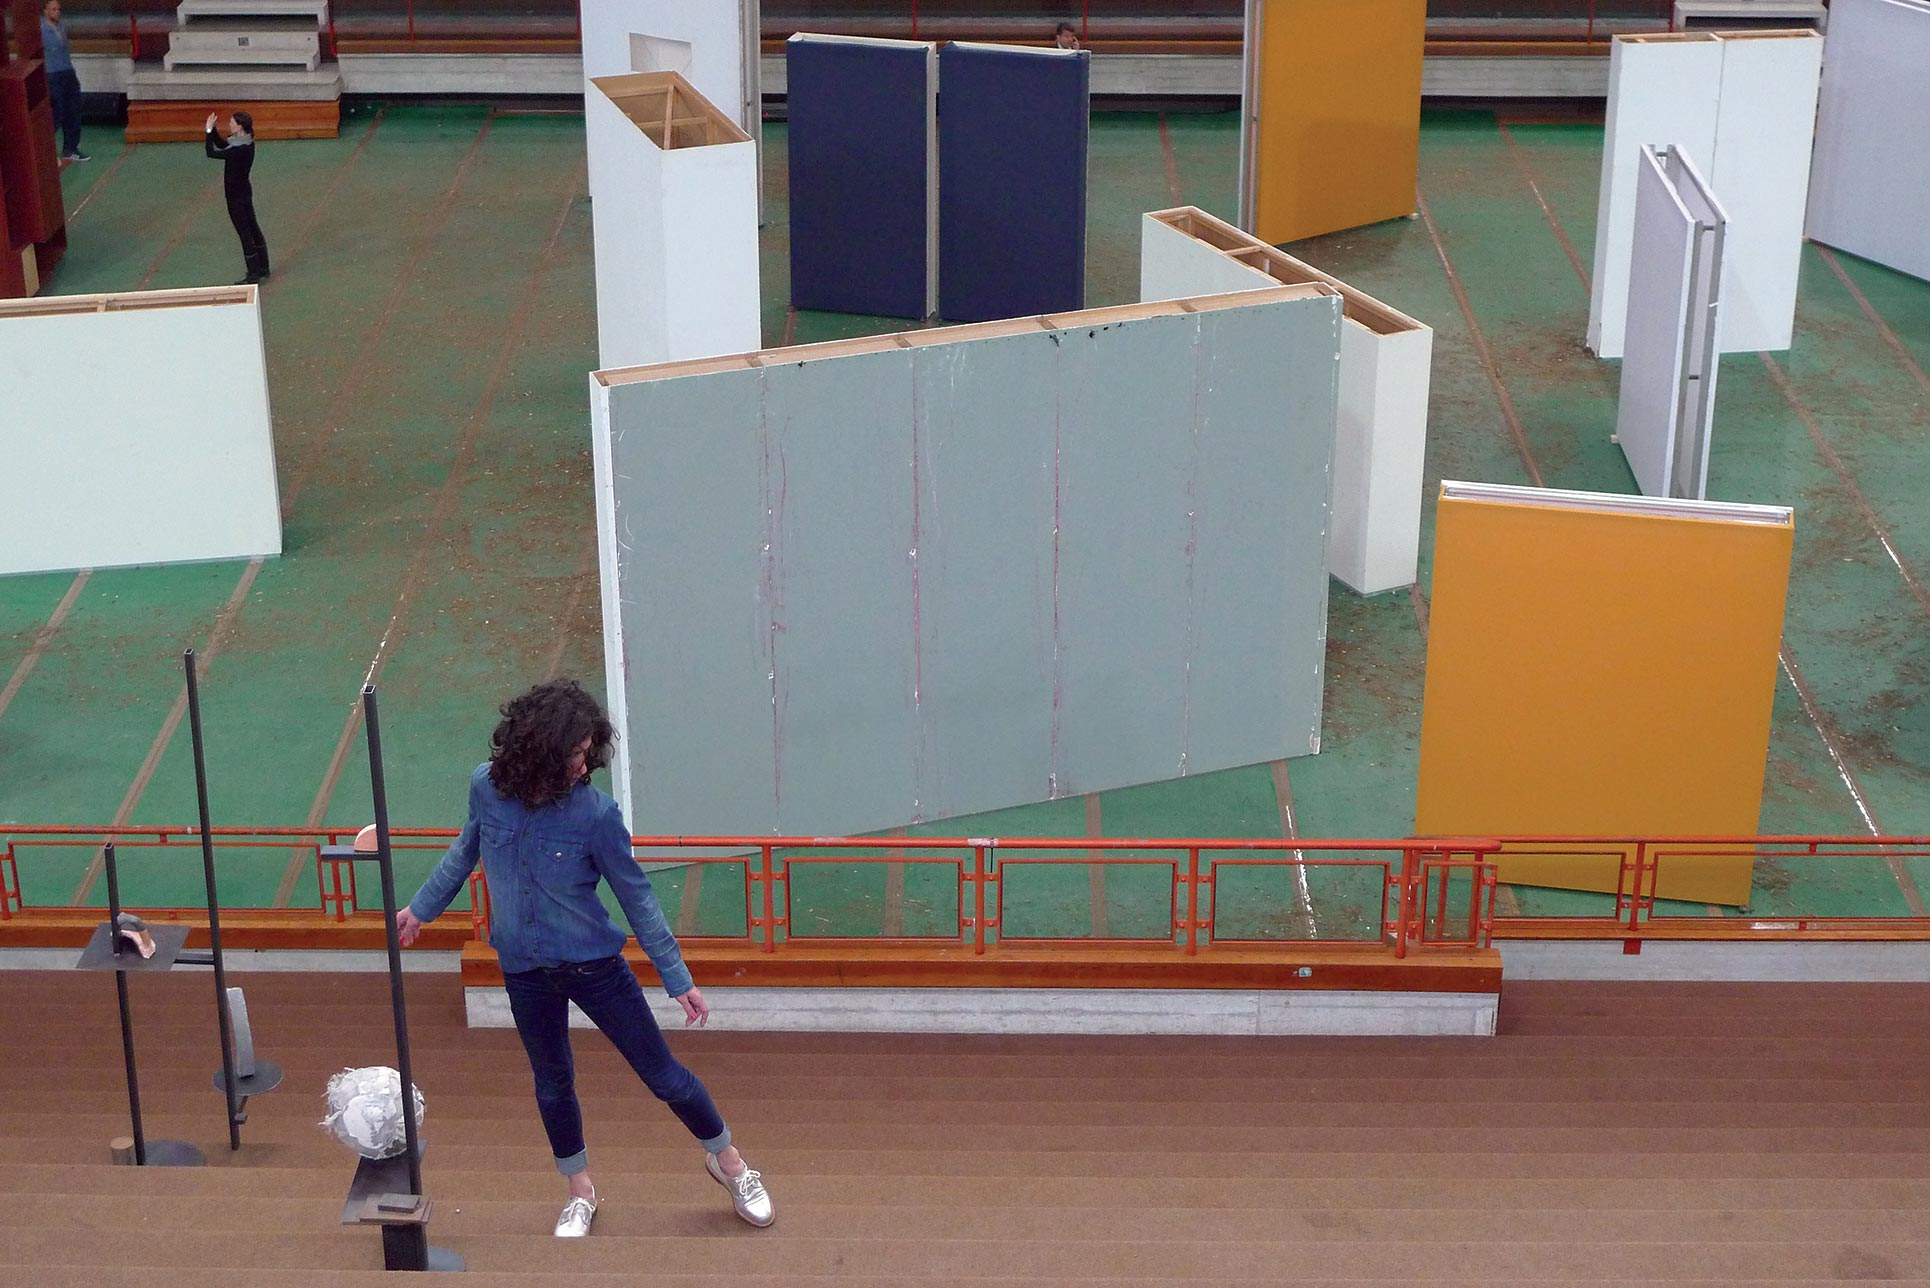 Maria Hassabi · Intermission, Life installazione; behind Gabriel Lester, Cousins, Walls